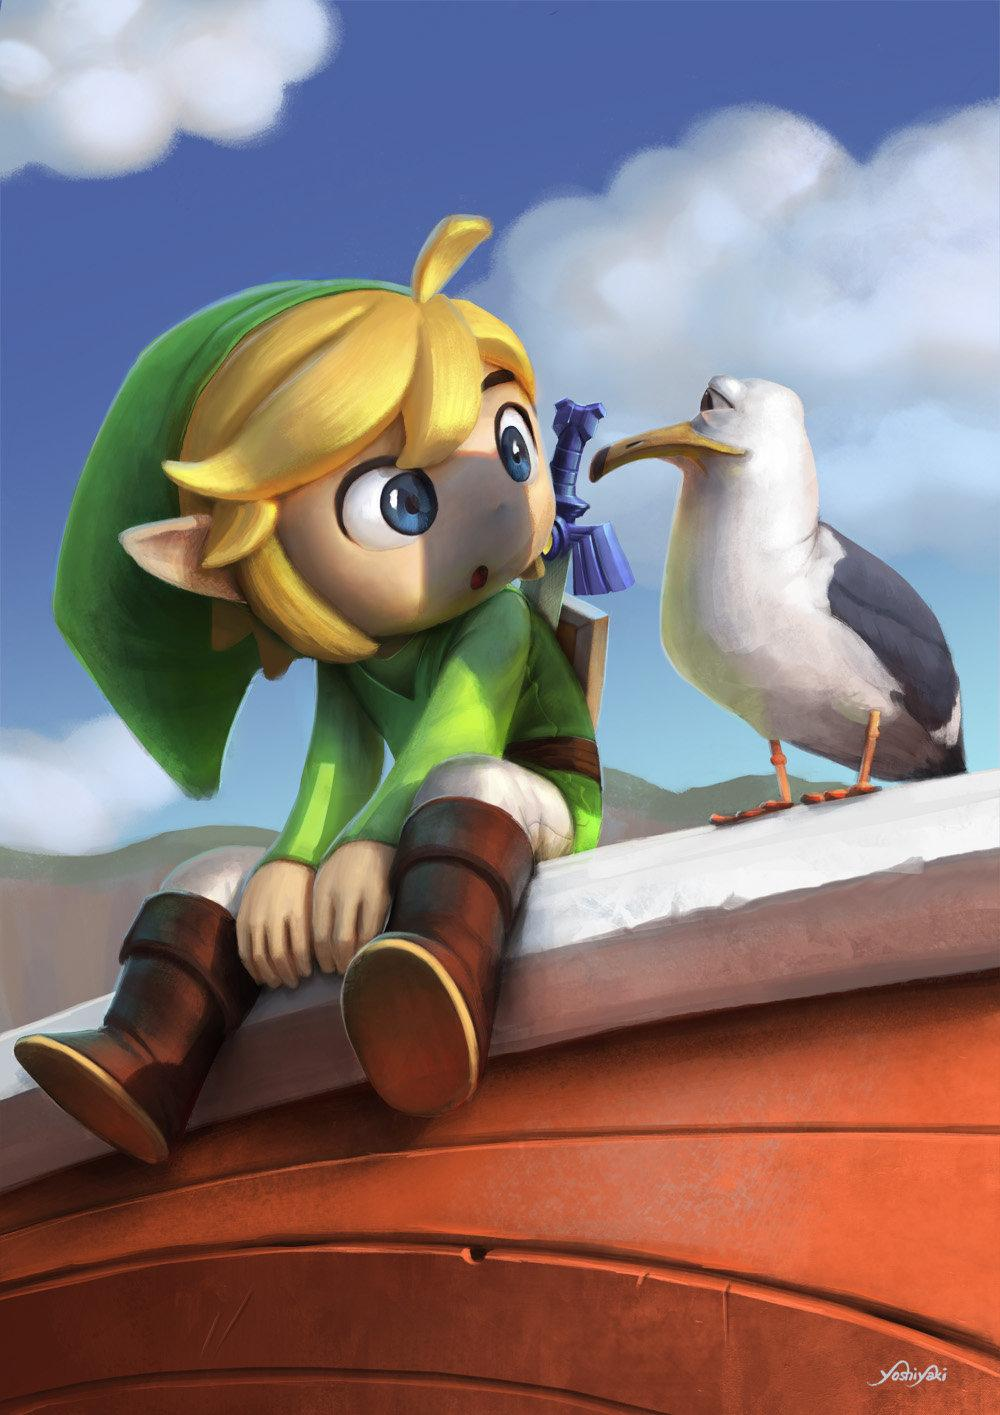 Link & Zelda Fan Arts par Cassio Yoshiyaki #nintendo #zelda http://t.co/elhu5AiyI2